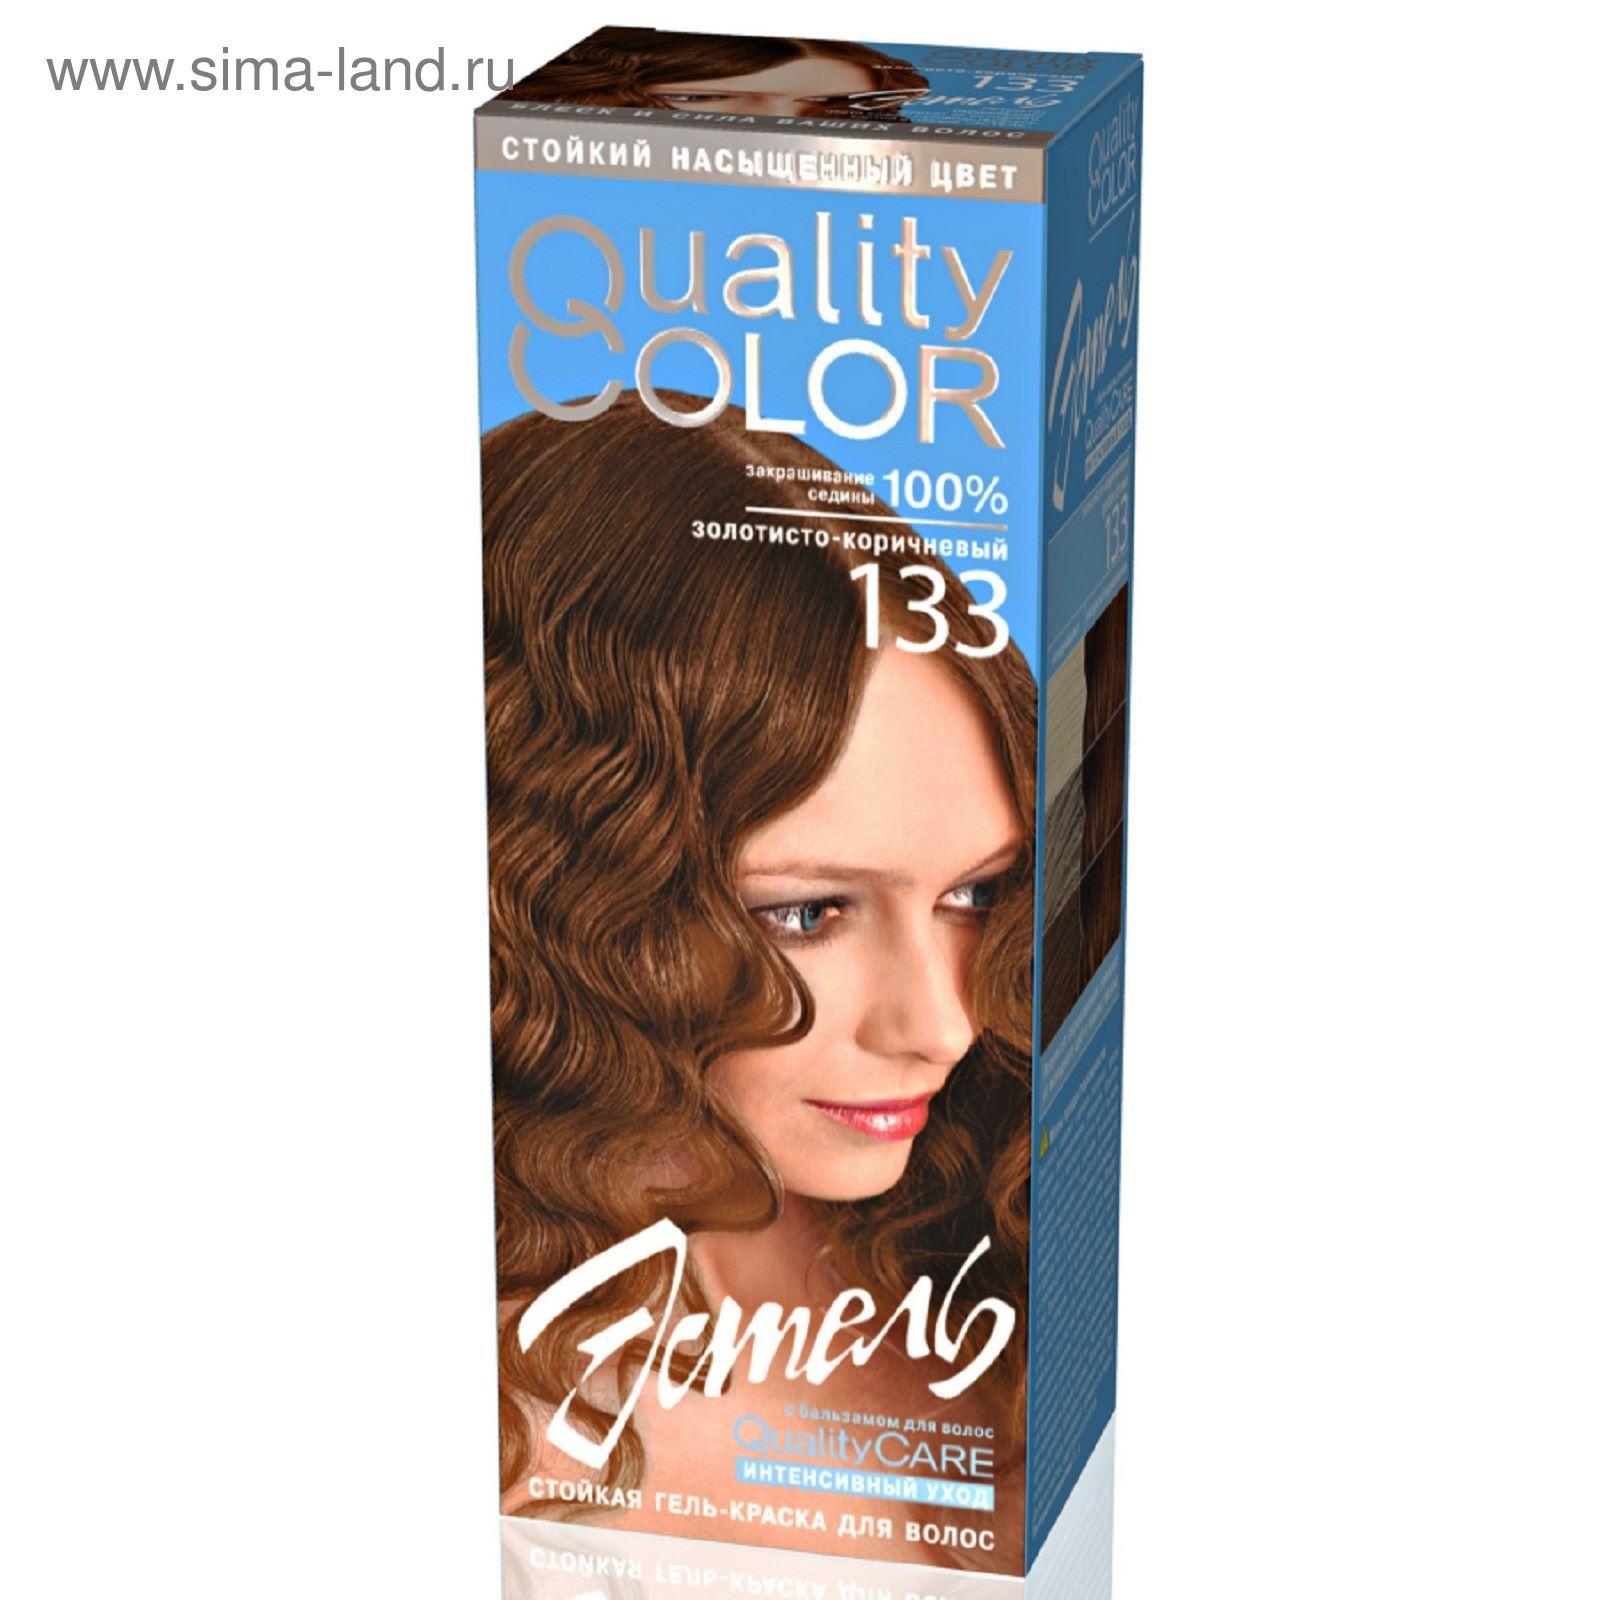 Estel tint balsam: a good quality hair care product 73